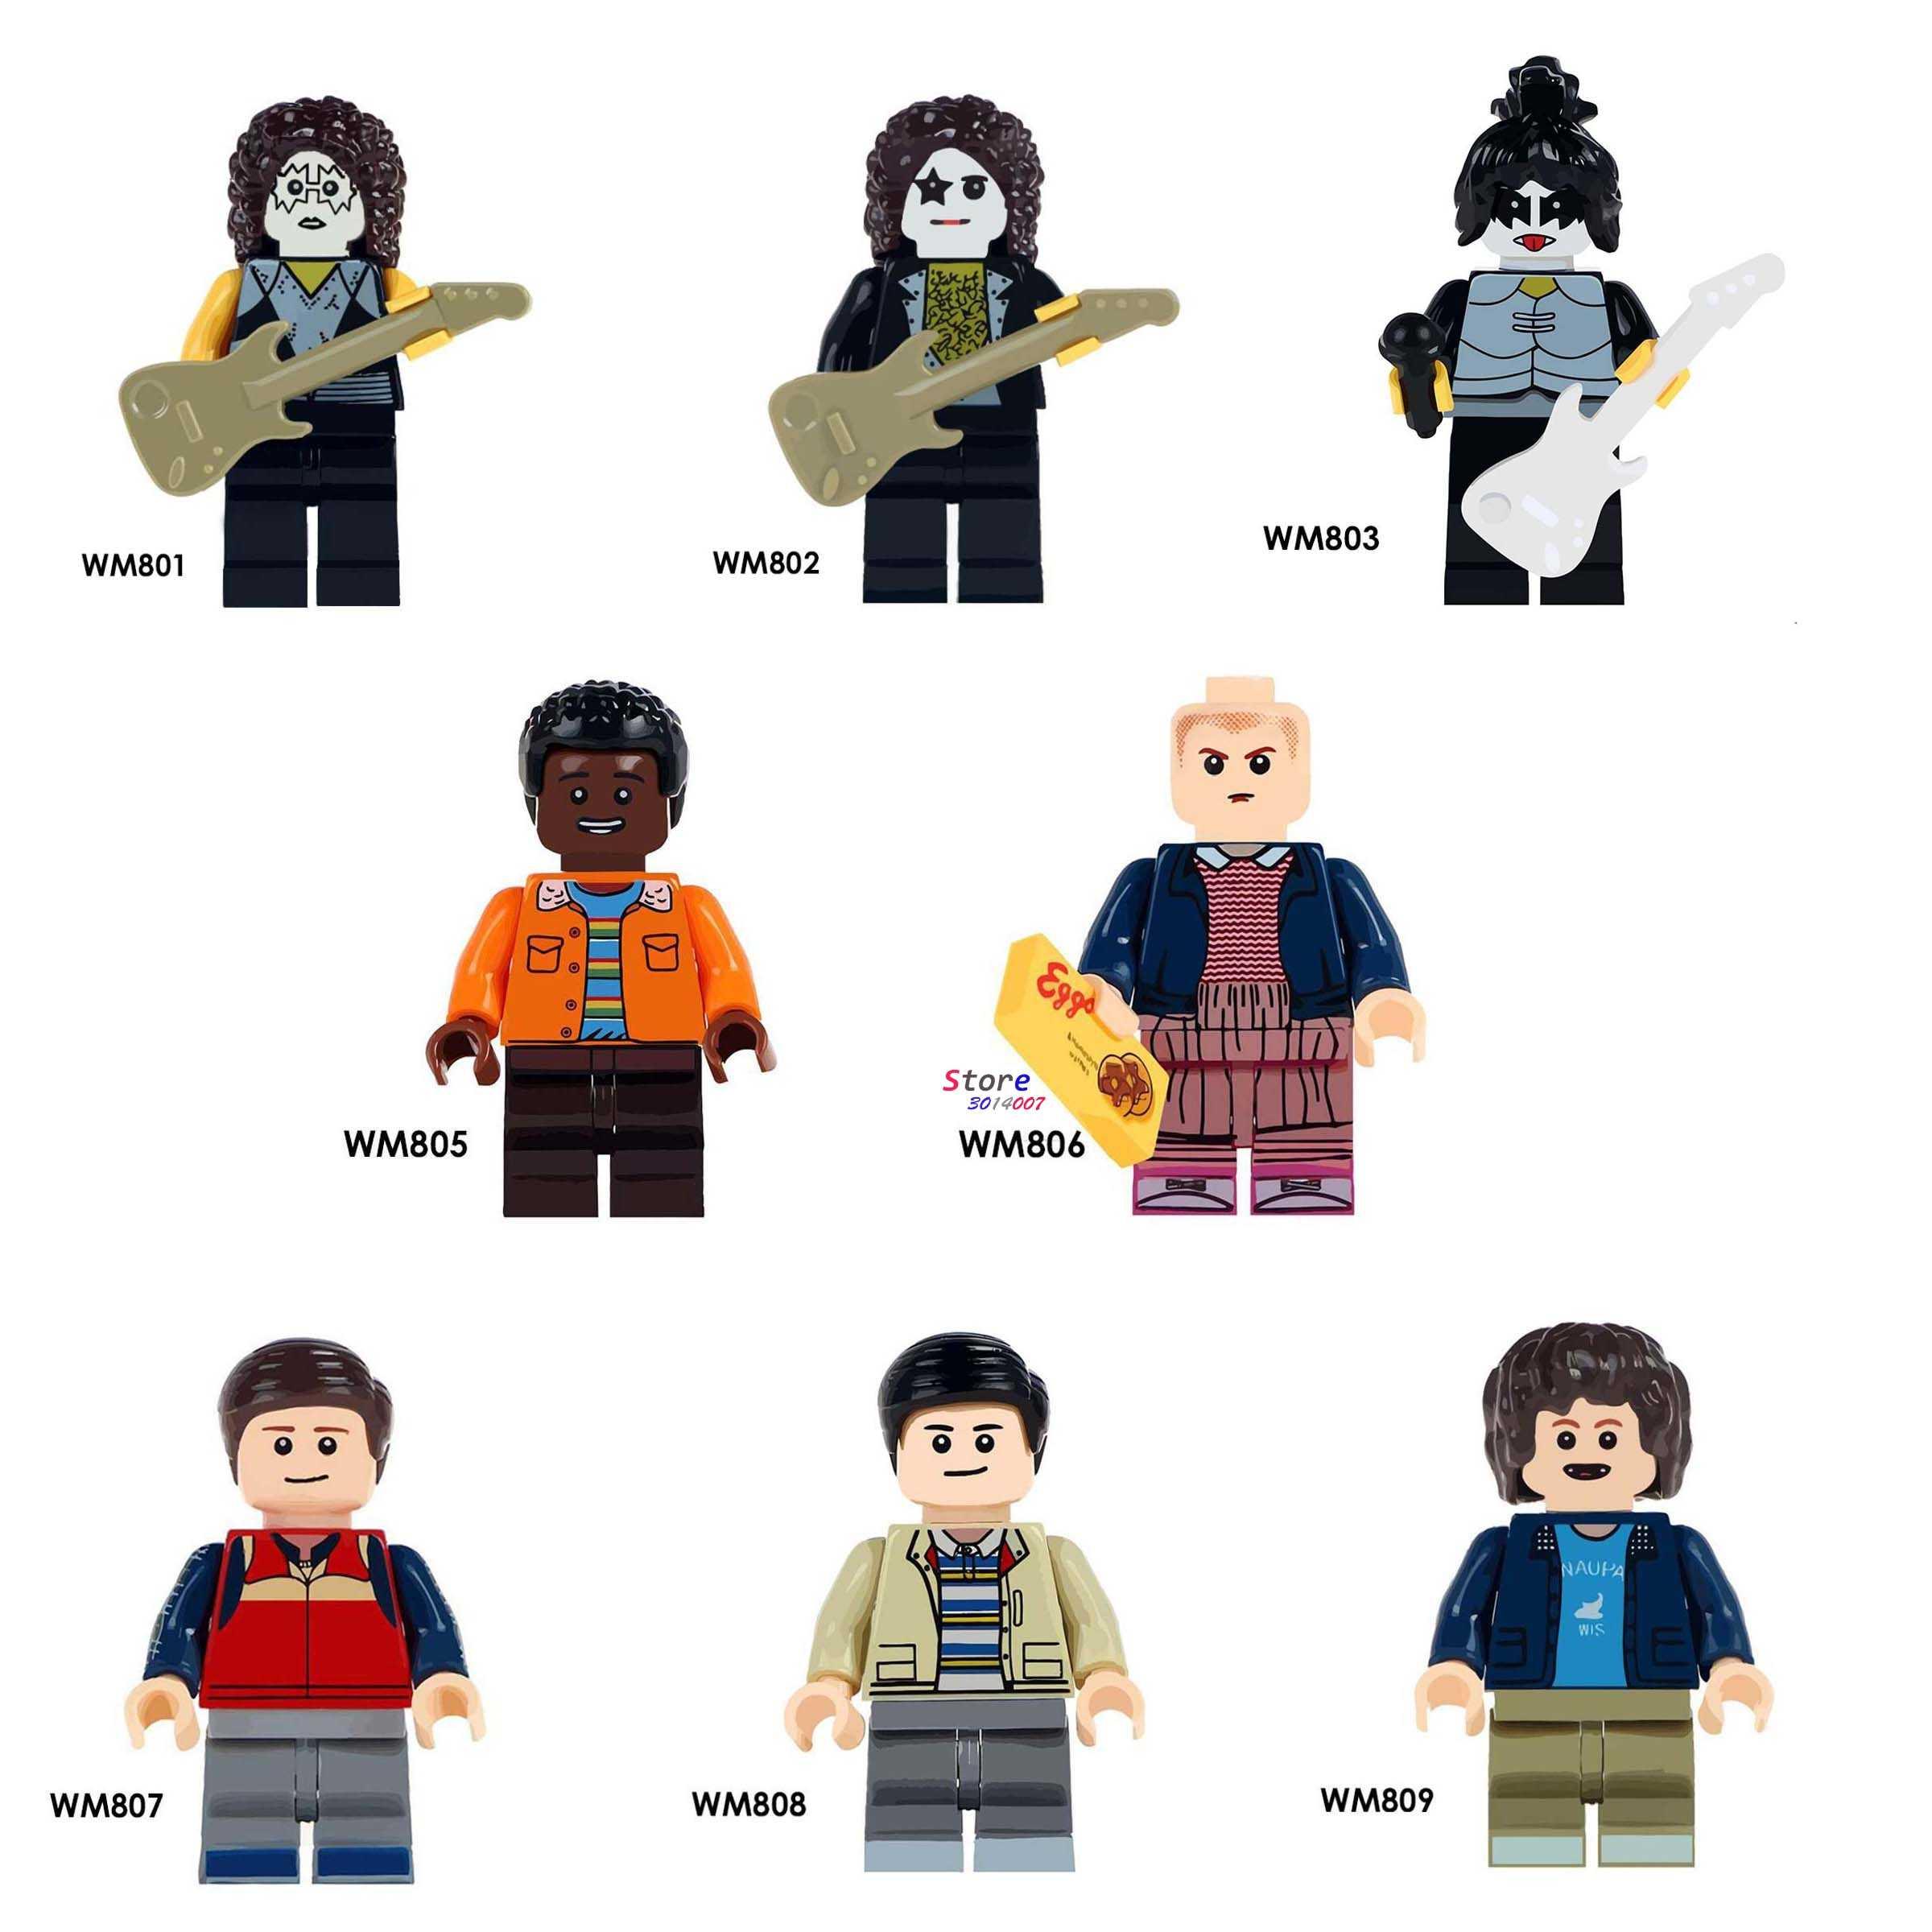 Single Band นักร้อง Kiss Simmons คนแปลกหน้าไมค์ดัสตินลูคัสสิบเอ็ดจะอาคารบล็อกของเล่นเด็ก